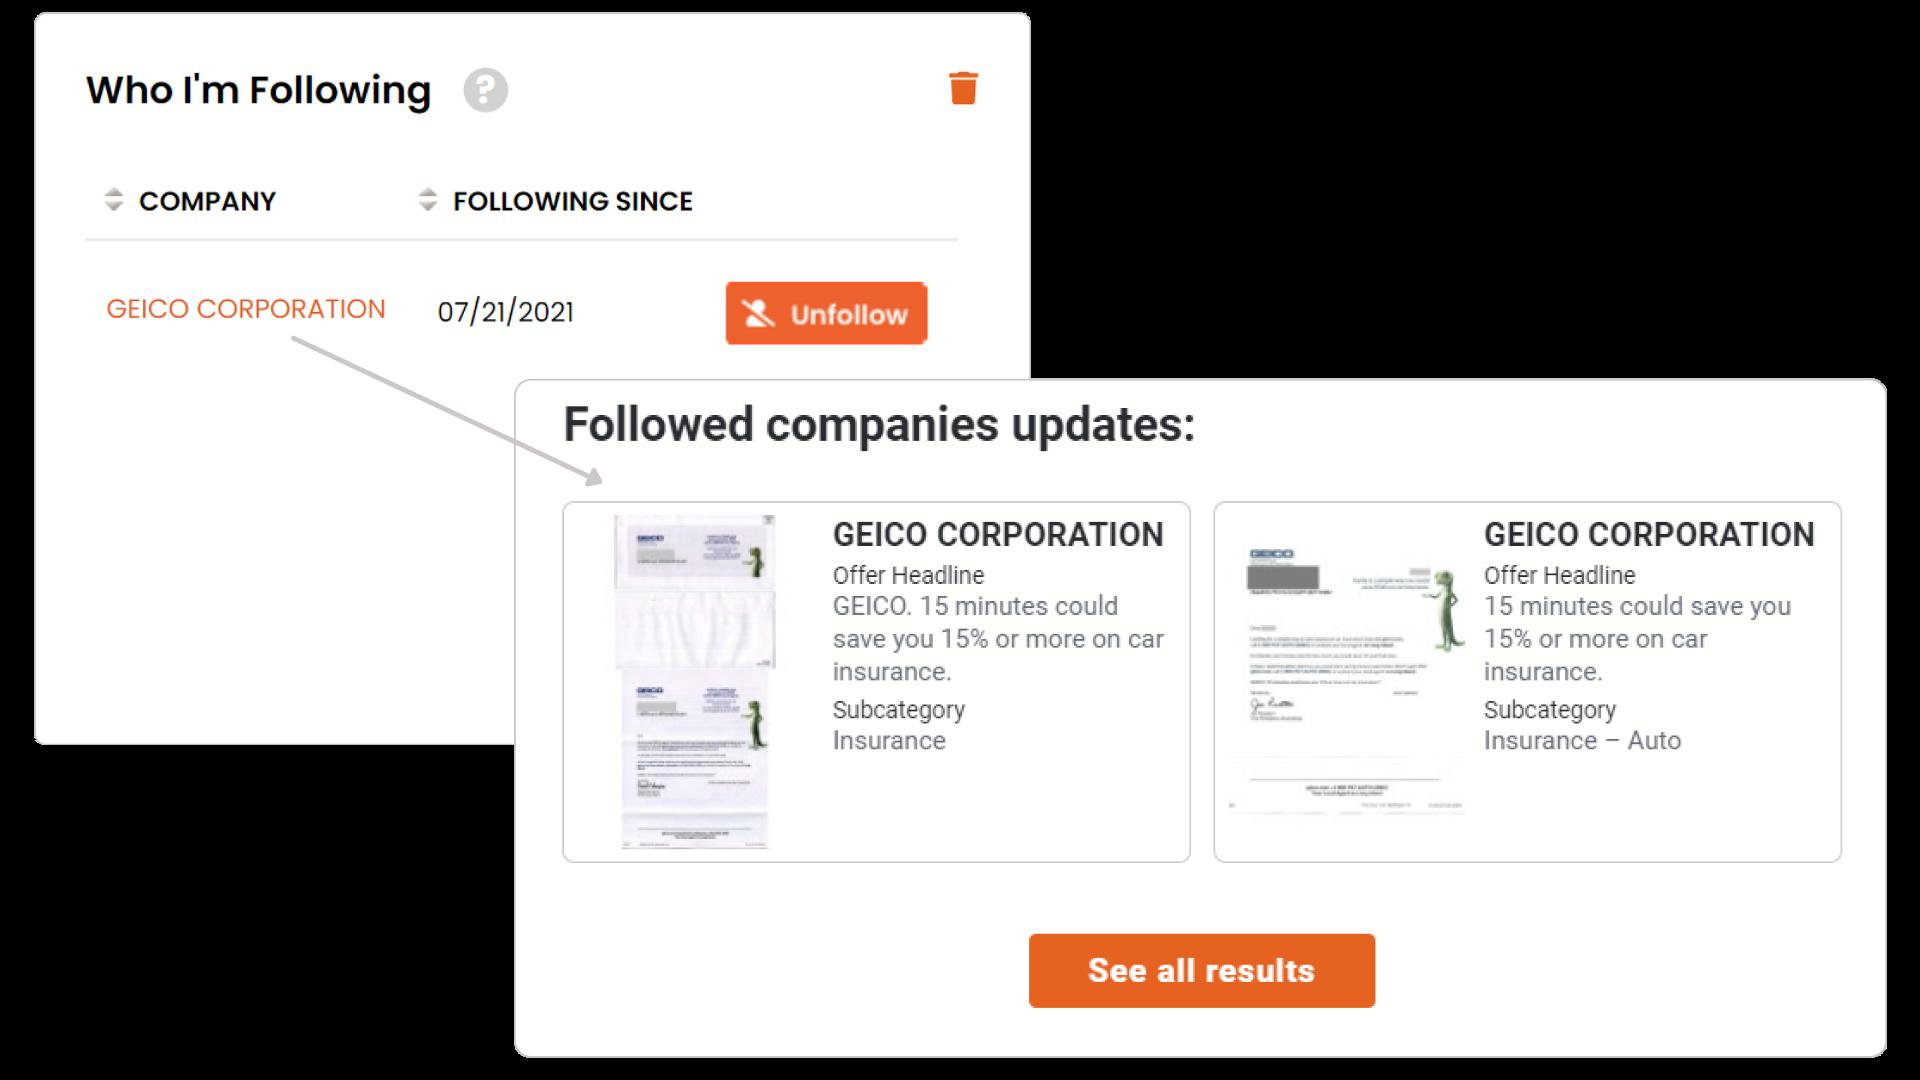 followed companies updates